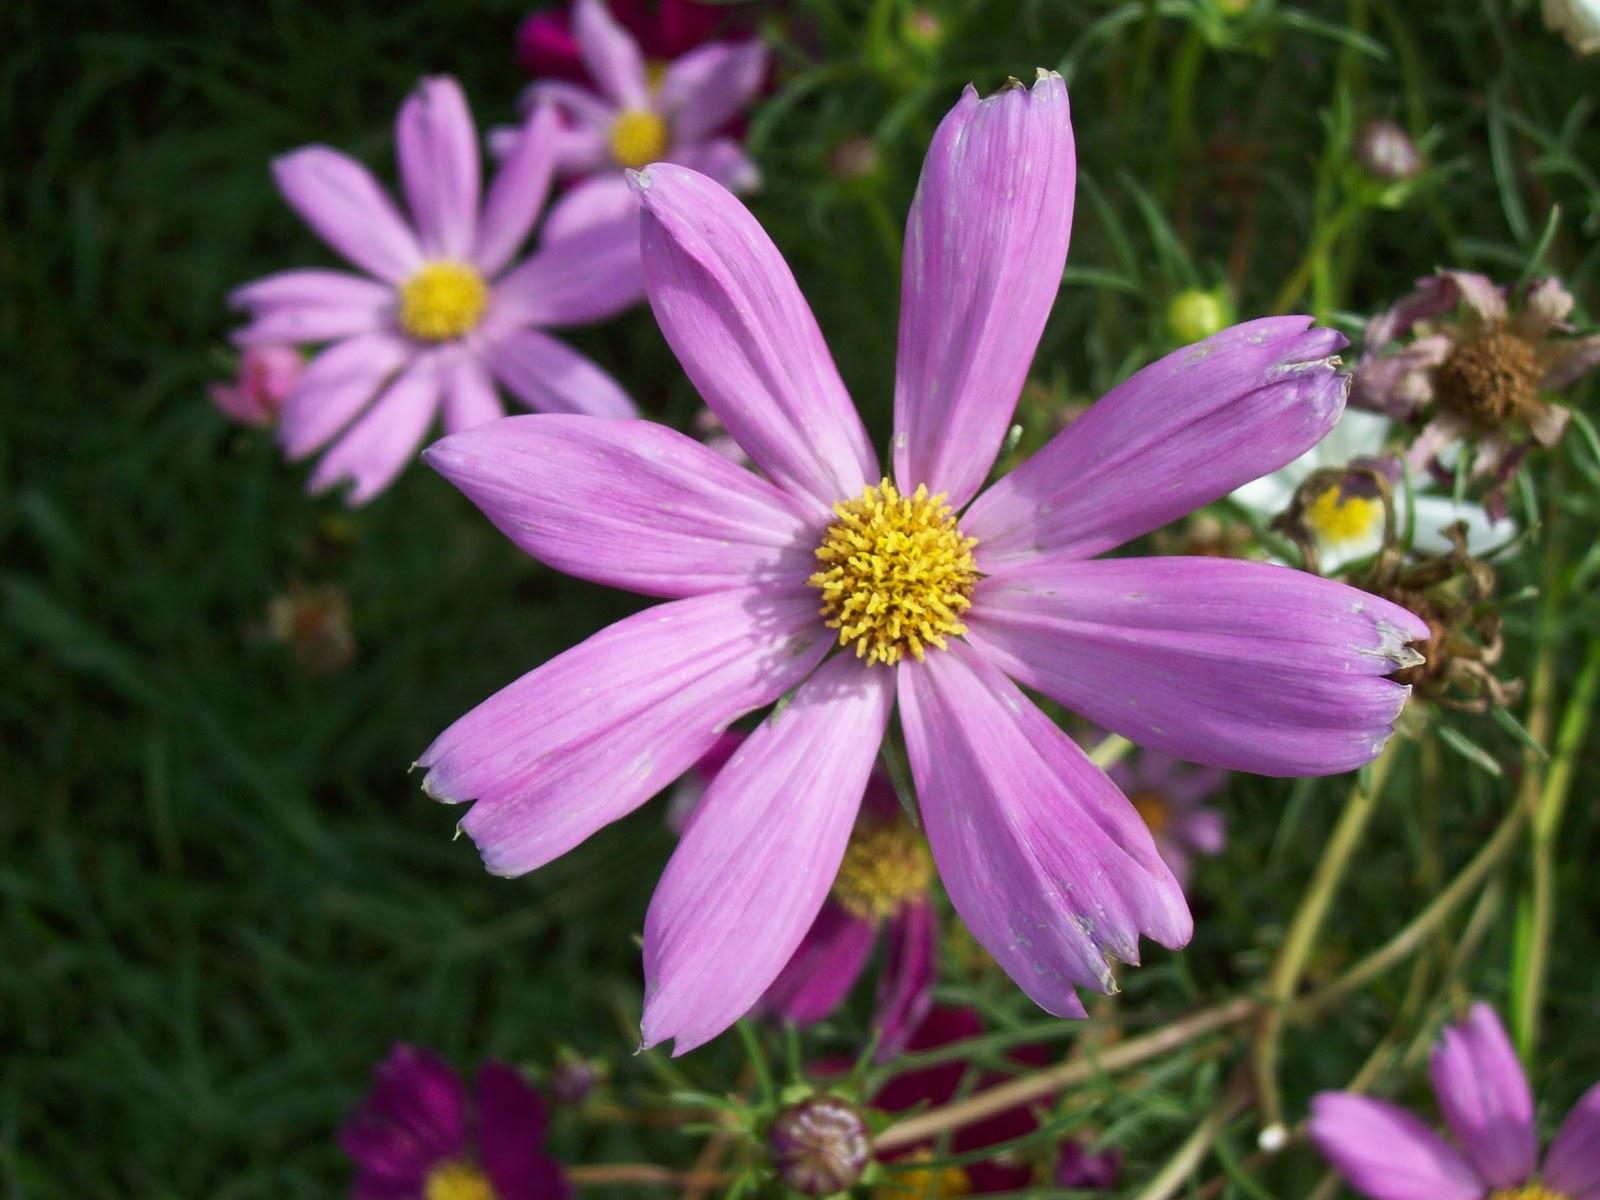 Gardening 2009 - 101_4492.JPG